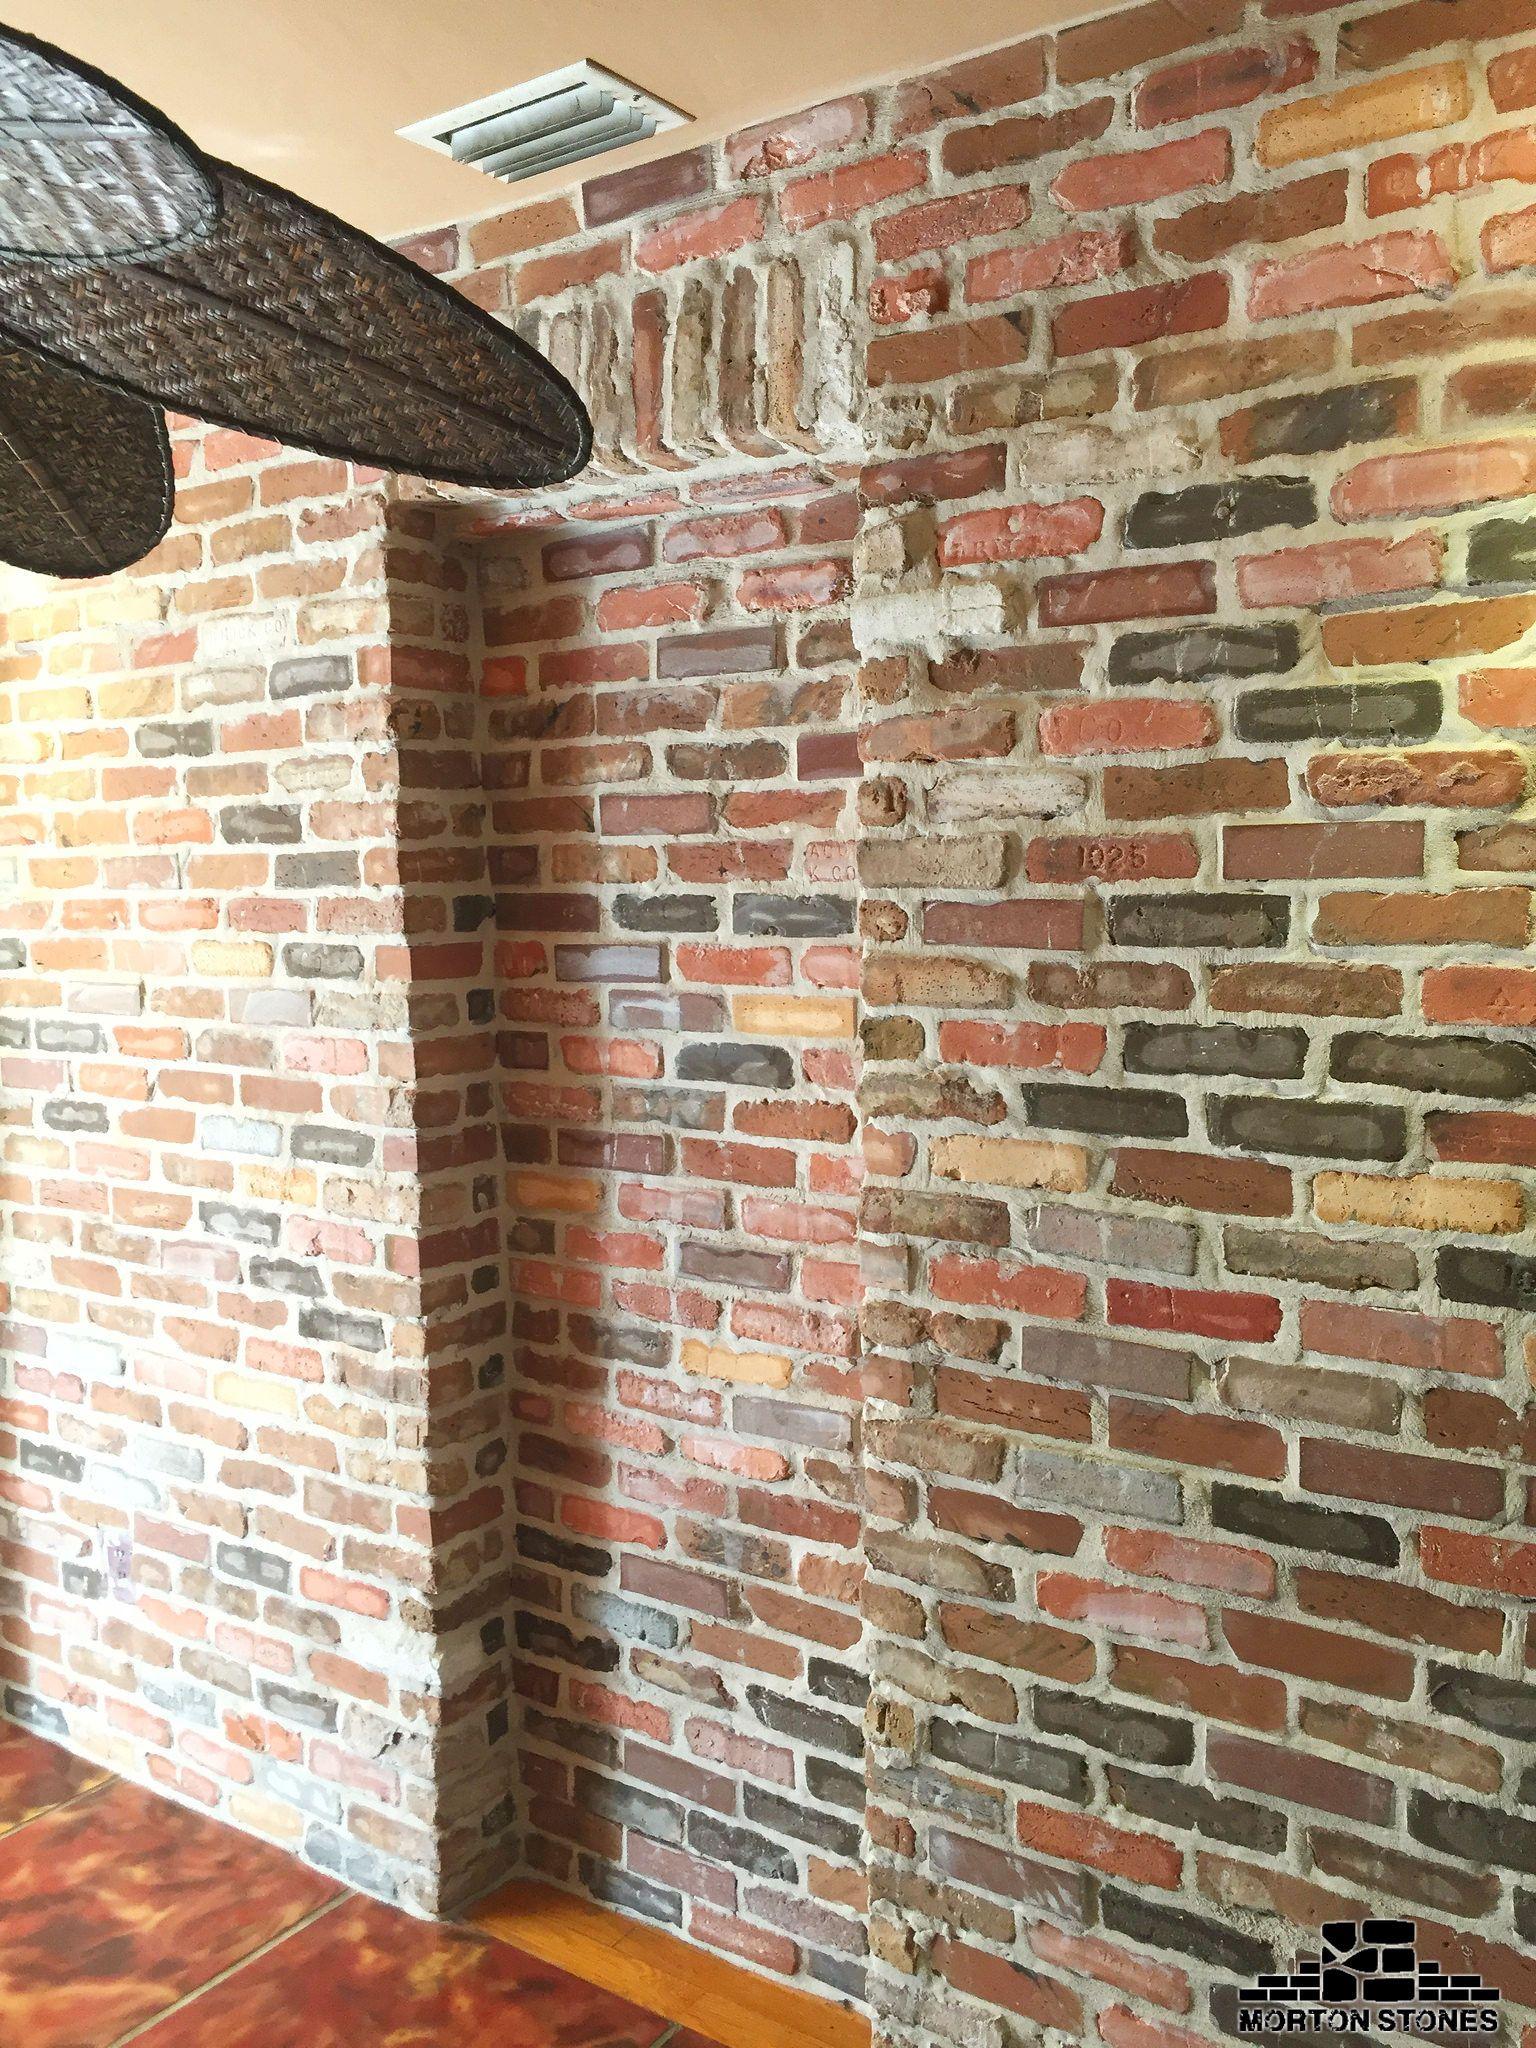 Installing Brick Veneers On A Wall Inside A Home Mortonstones Brick Tiles Rustic Thinbrick Home Decor R Brick Veneer Interior Design Rustic Brick Face